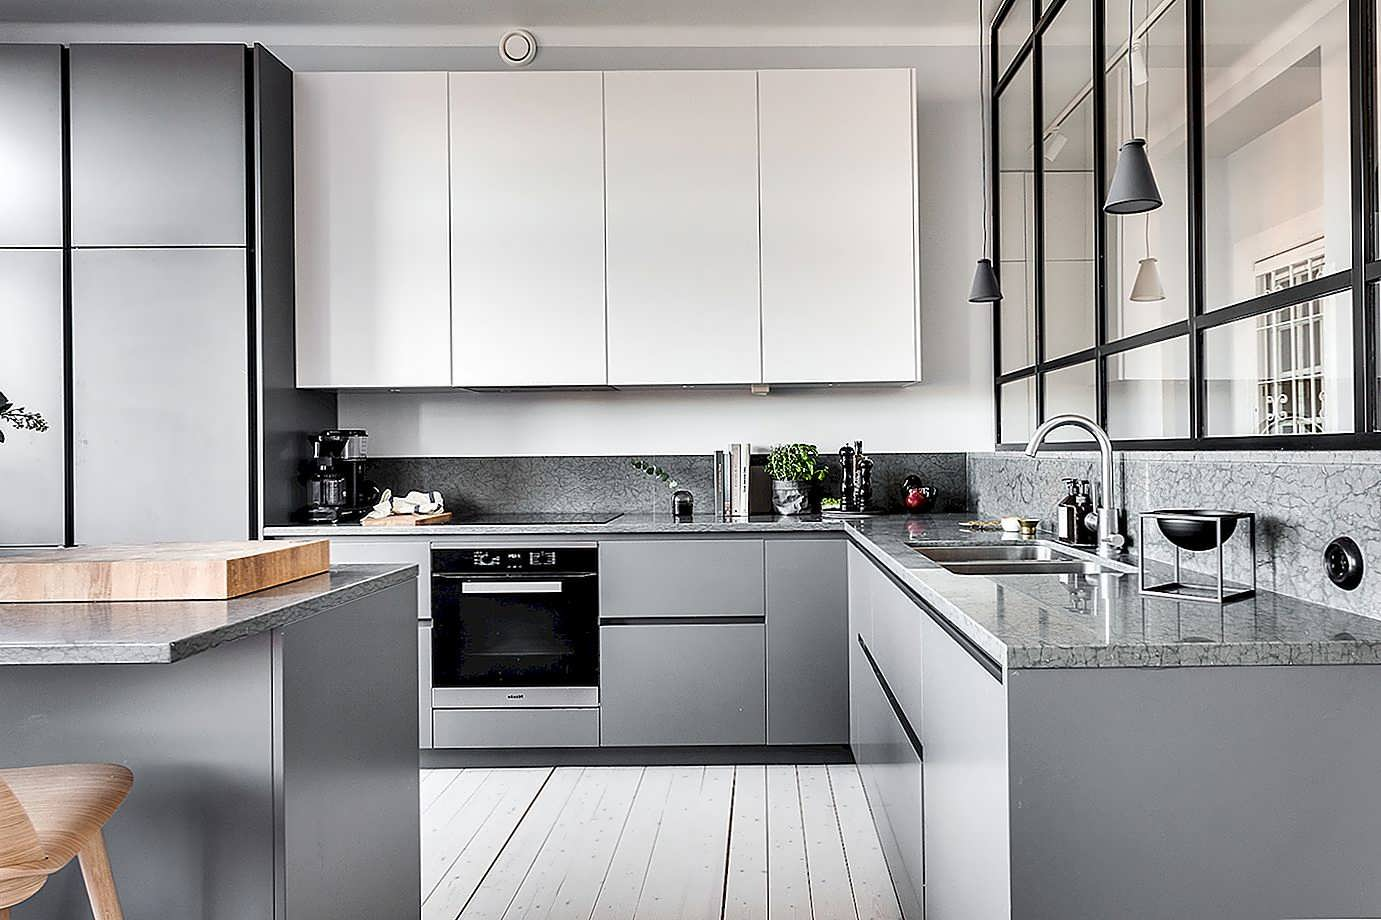 Кухня в стиле минимализм фото интерьер